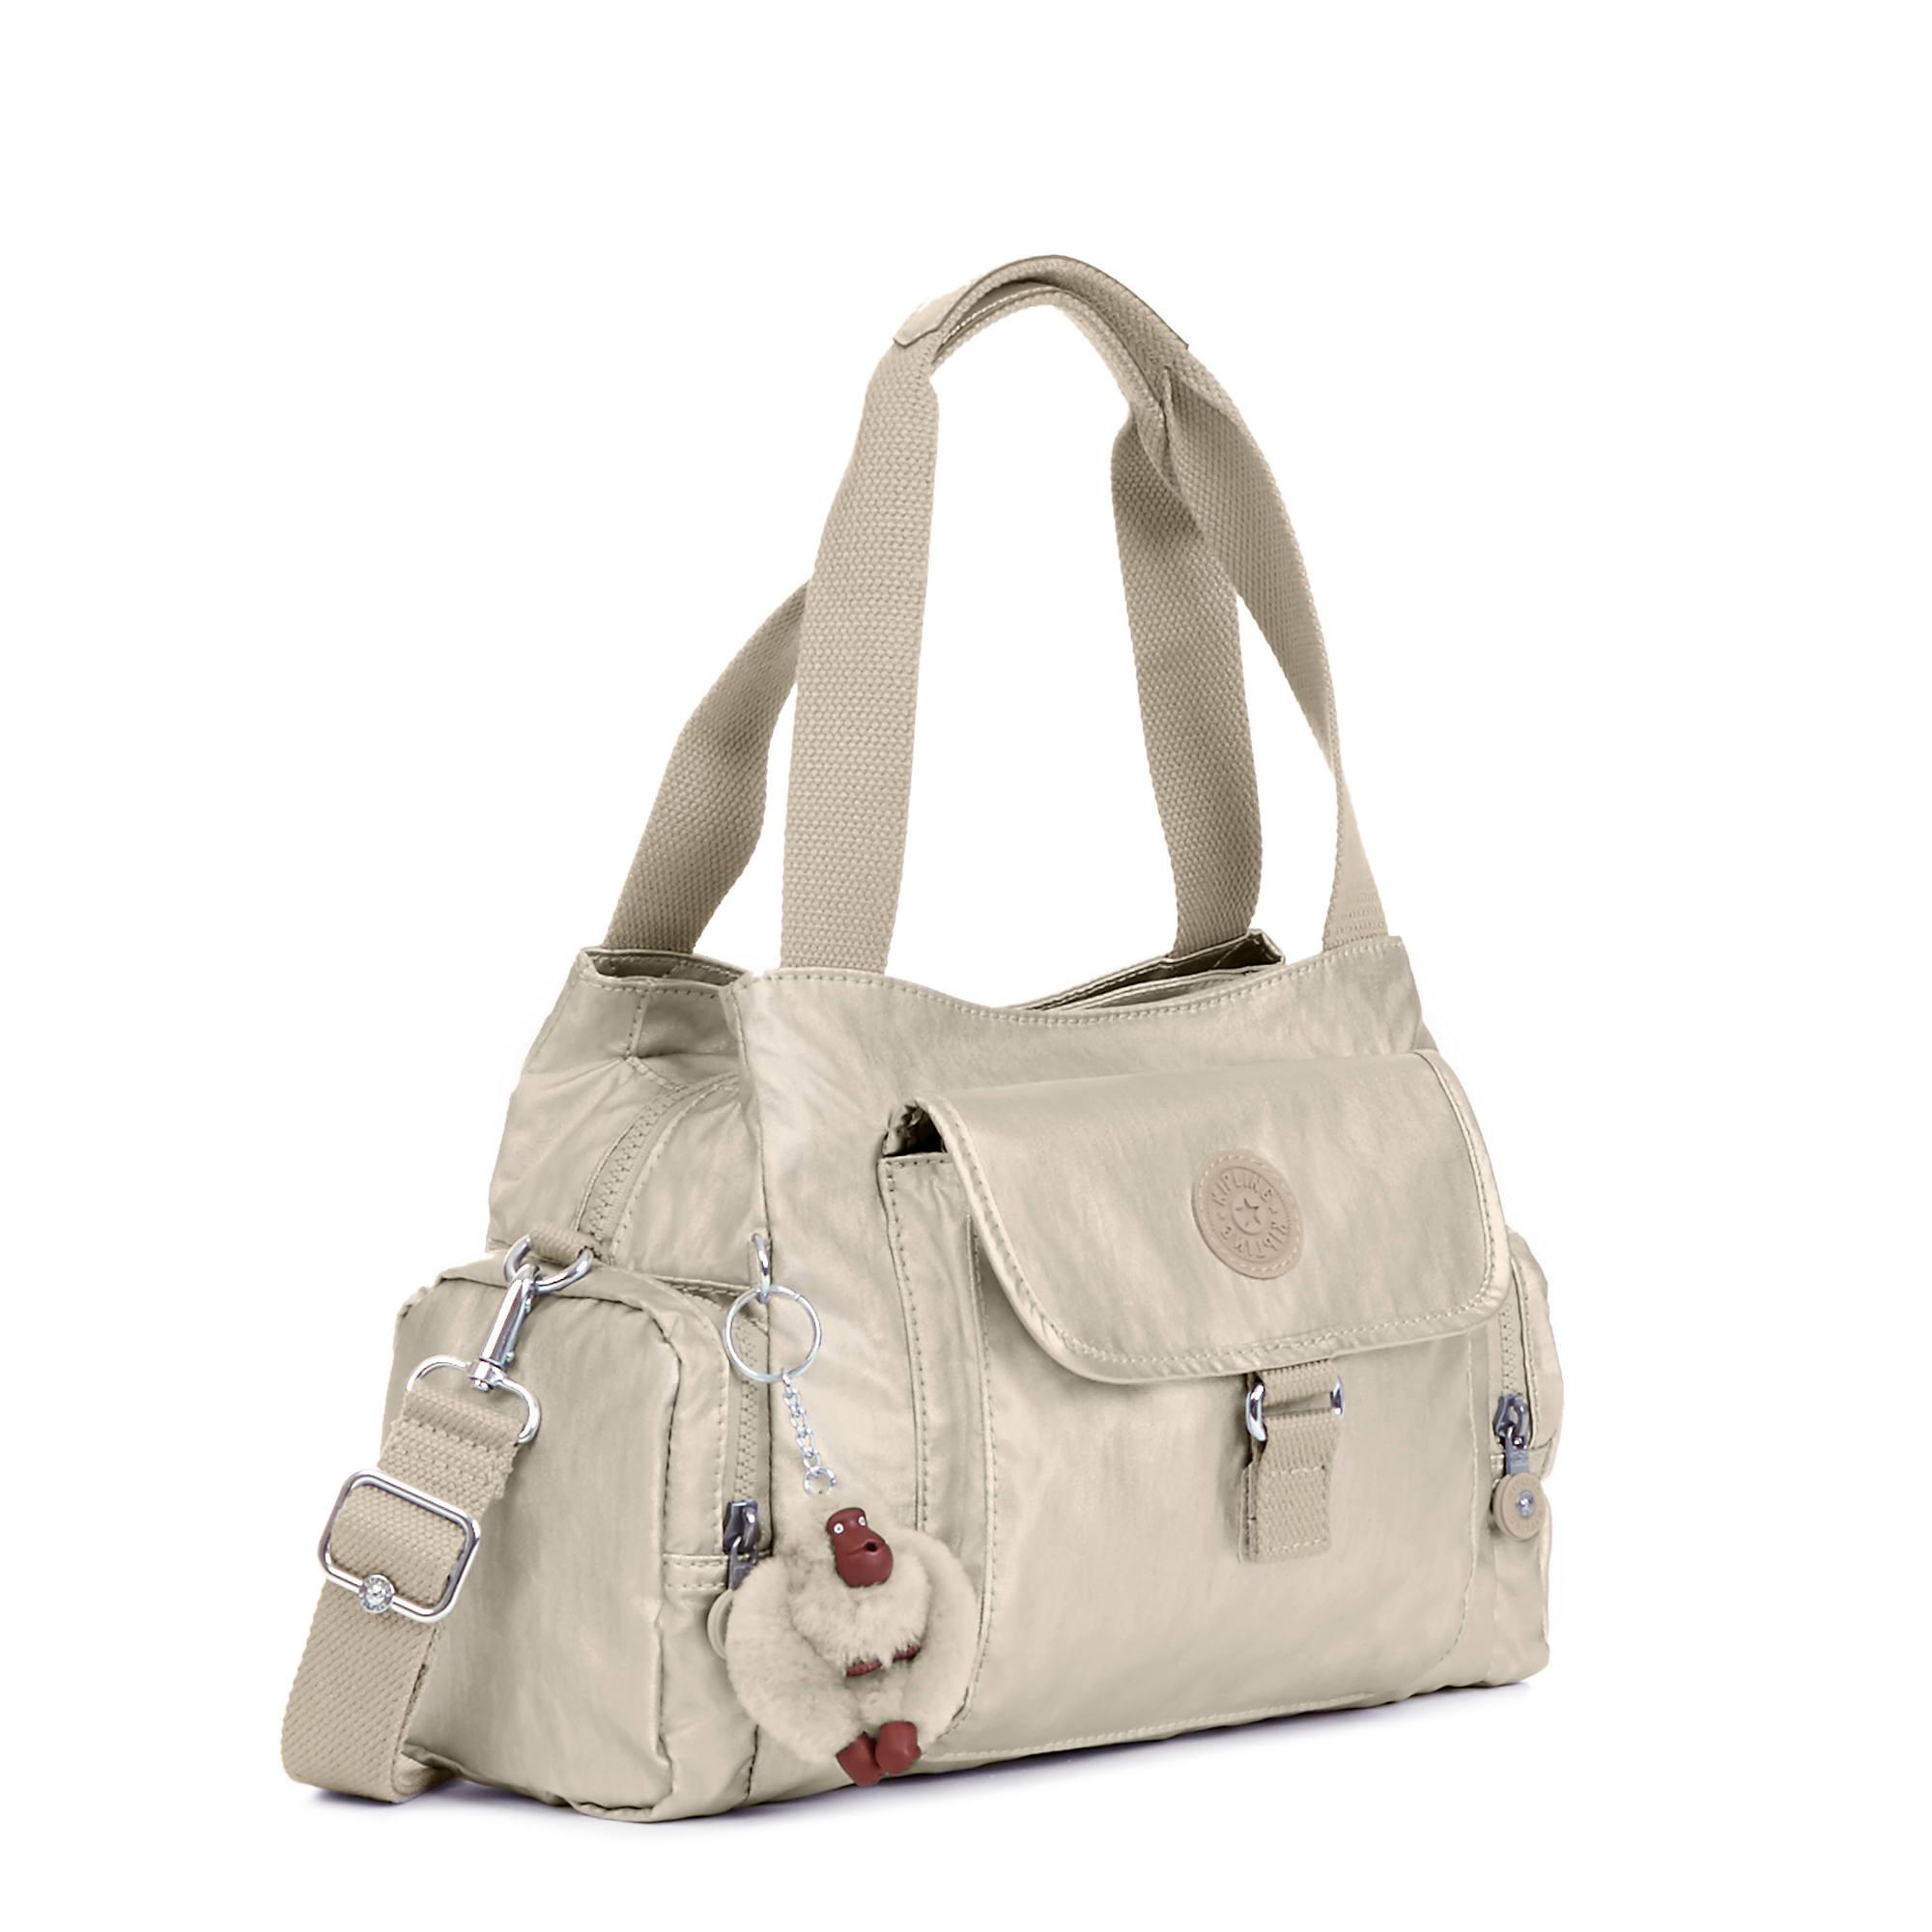 Kipling-Felix-Large-Handbag miniature 23